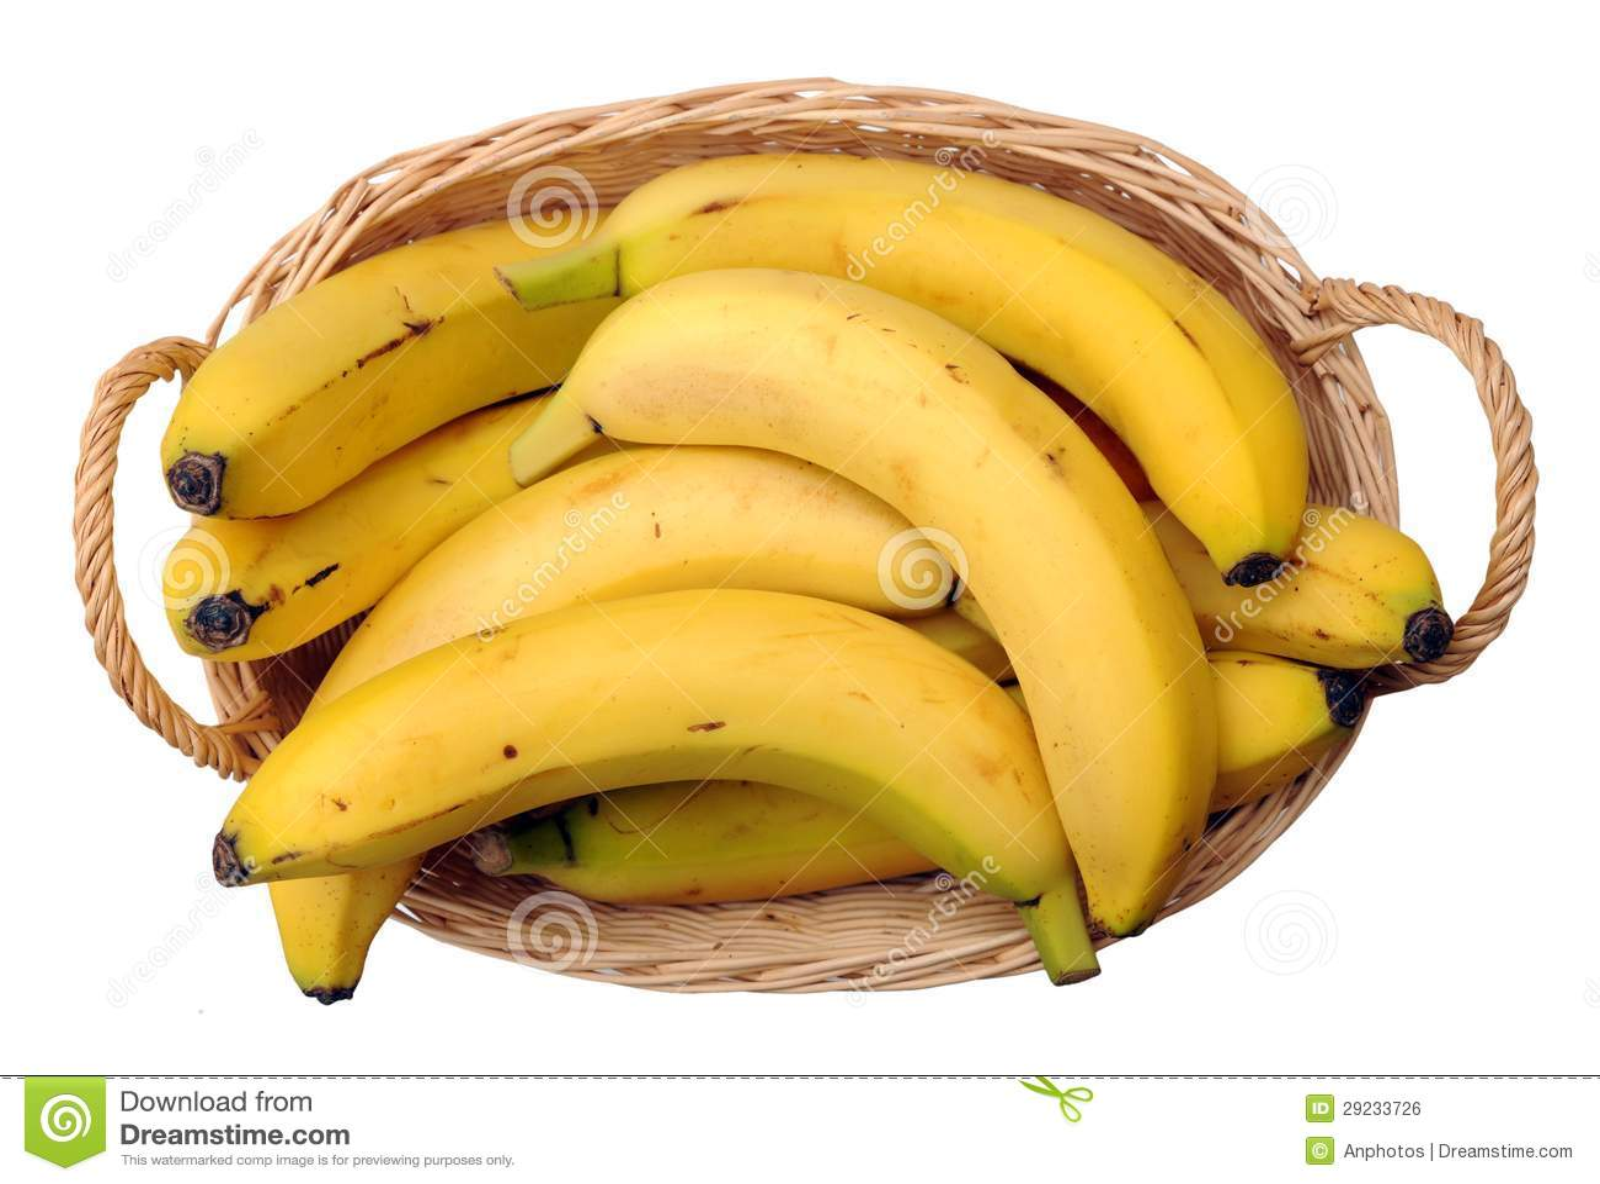 A Crate Of Banana Royalty Free Stock Image Image 29233726